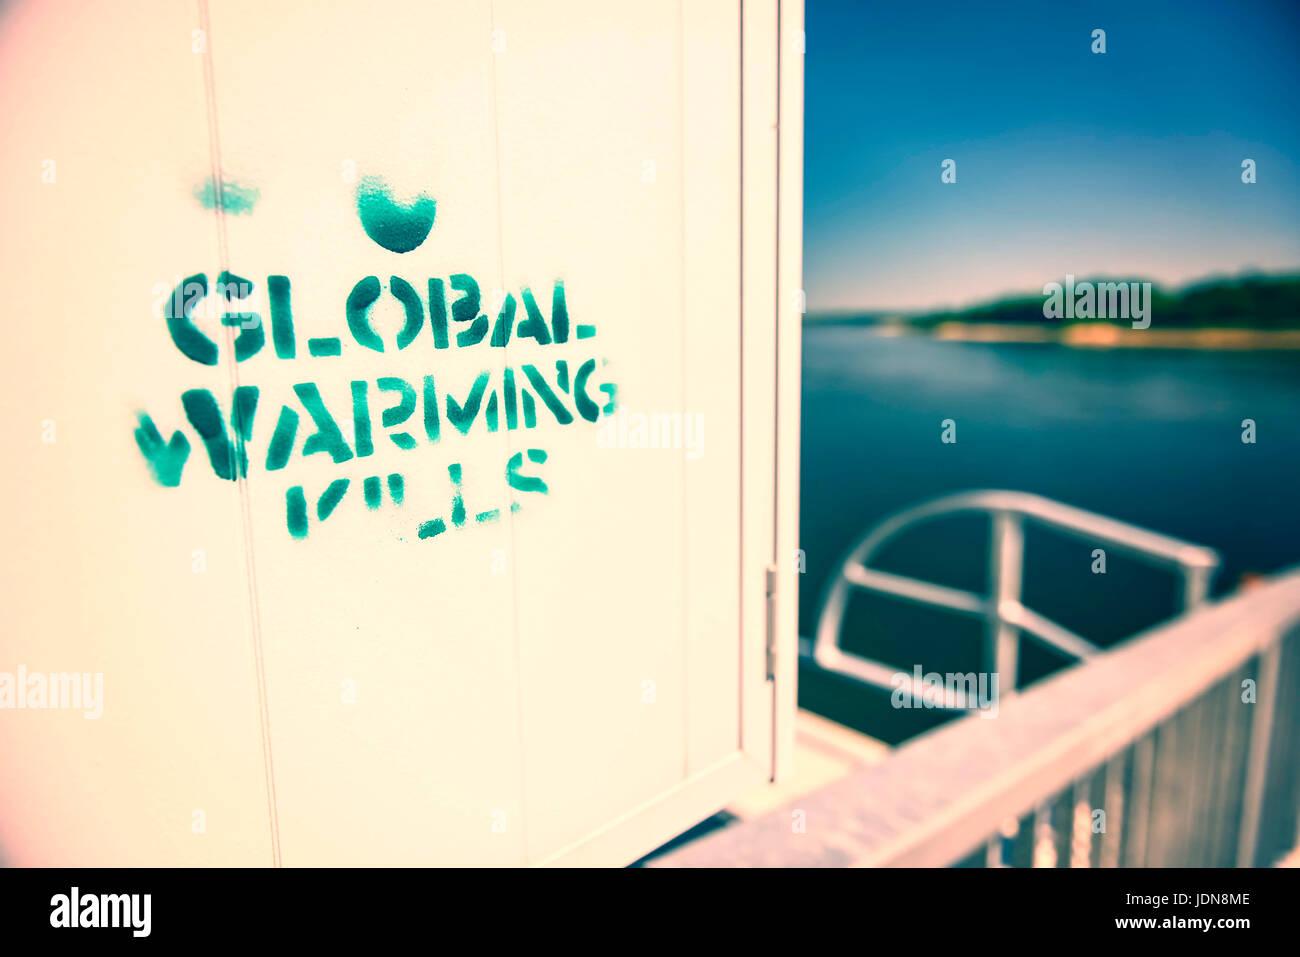 Graffiti Worldwide Warming Kills, Graffiti Global Warming Kills Stock Photo